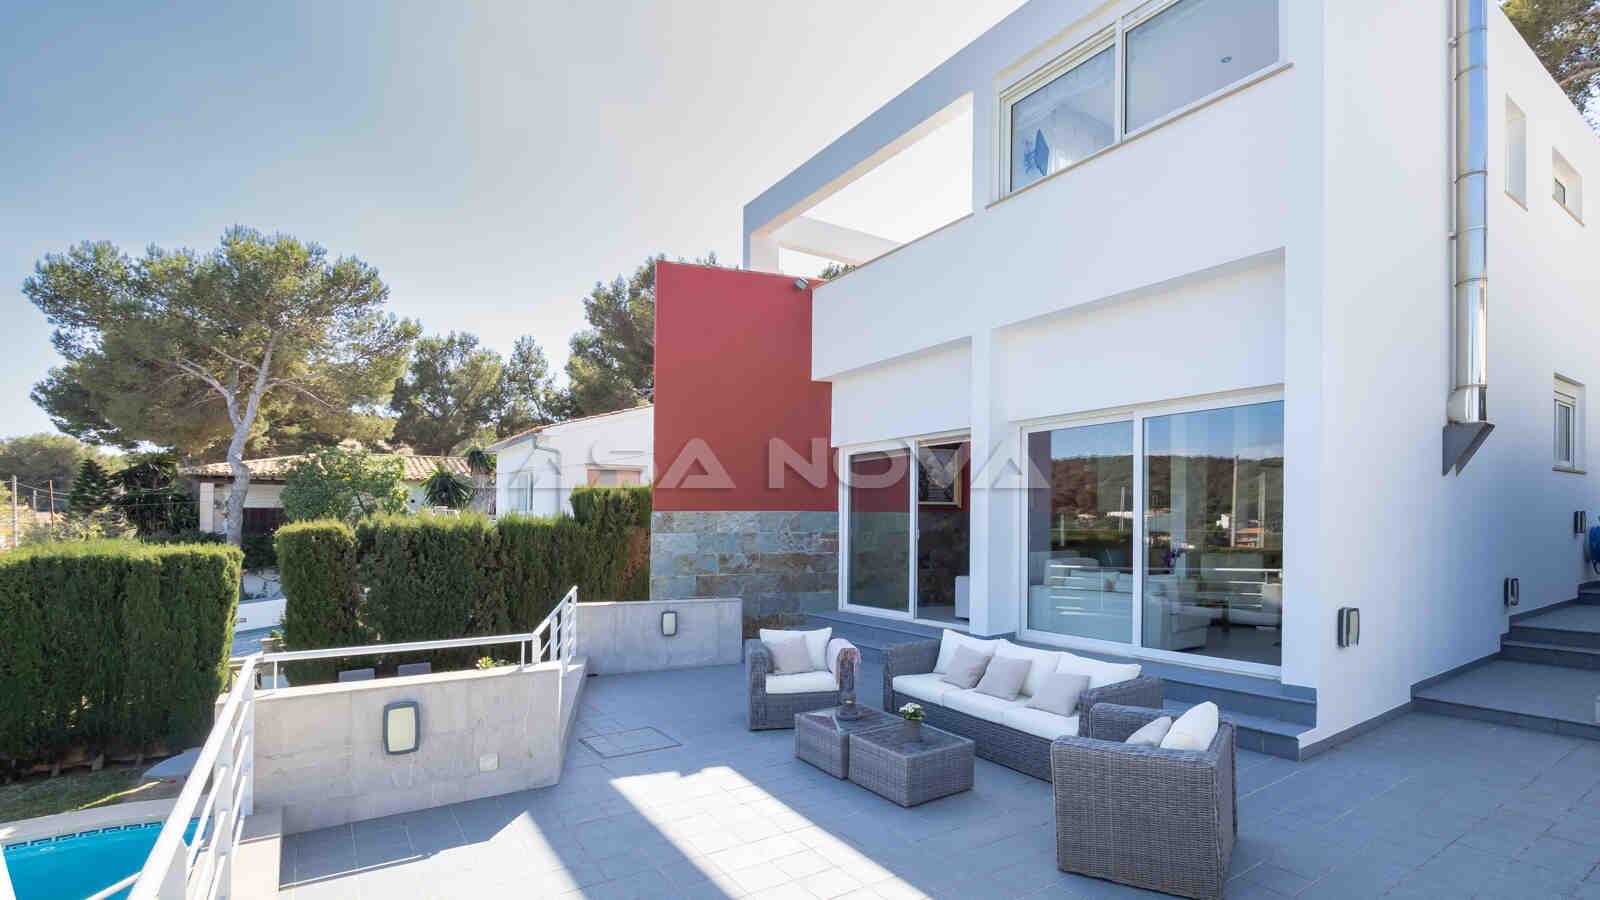 Tolle Mallorca Villa mit Pool in beliebter Lage